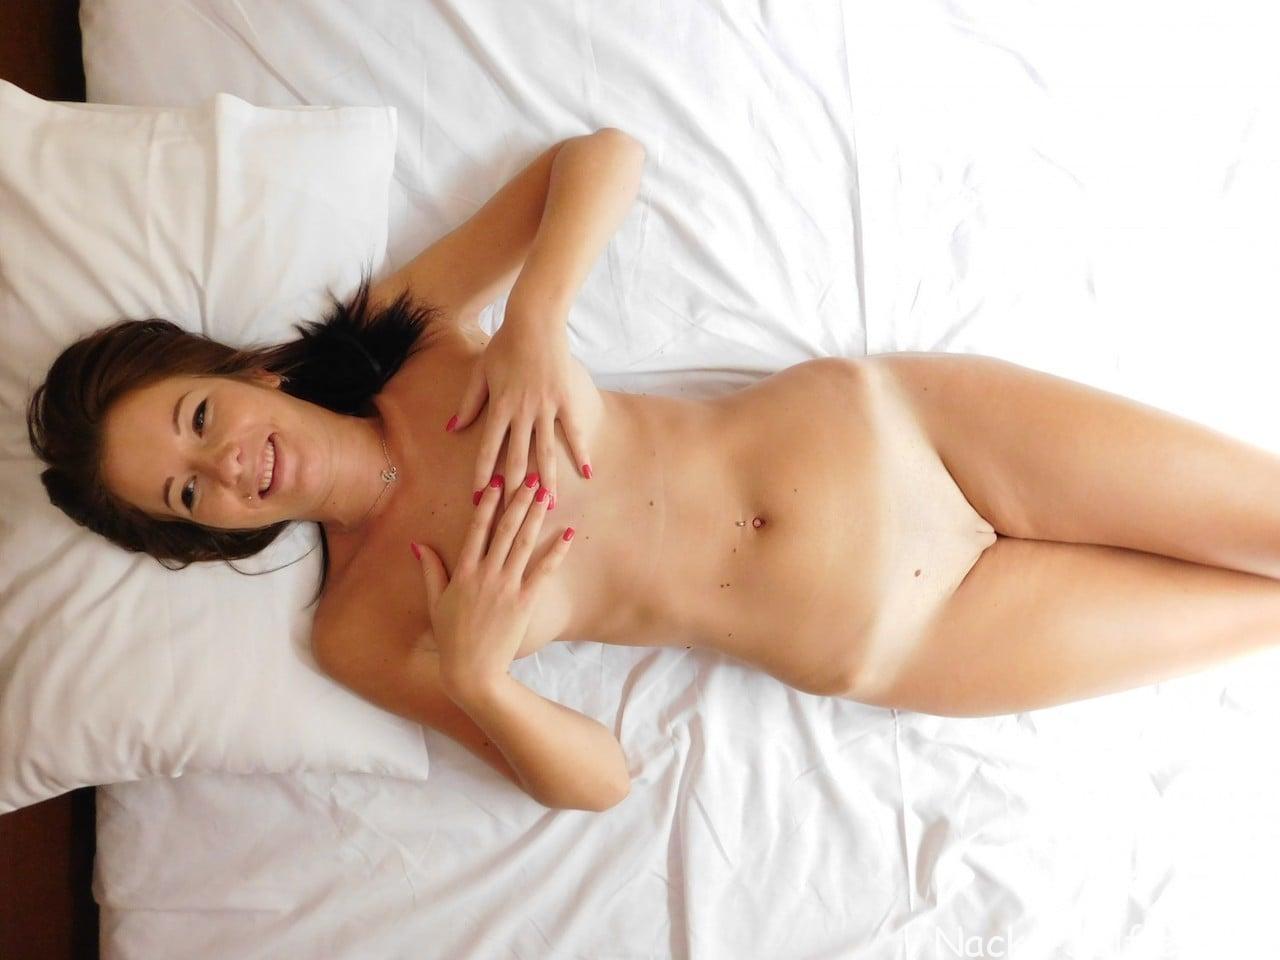 Private Nacktbilder Amateurin Amanda